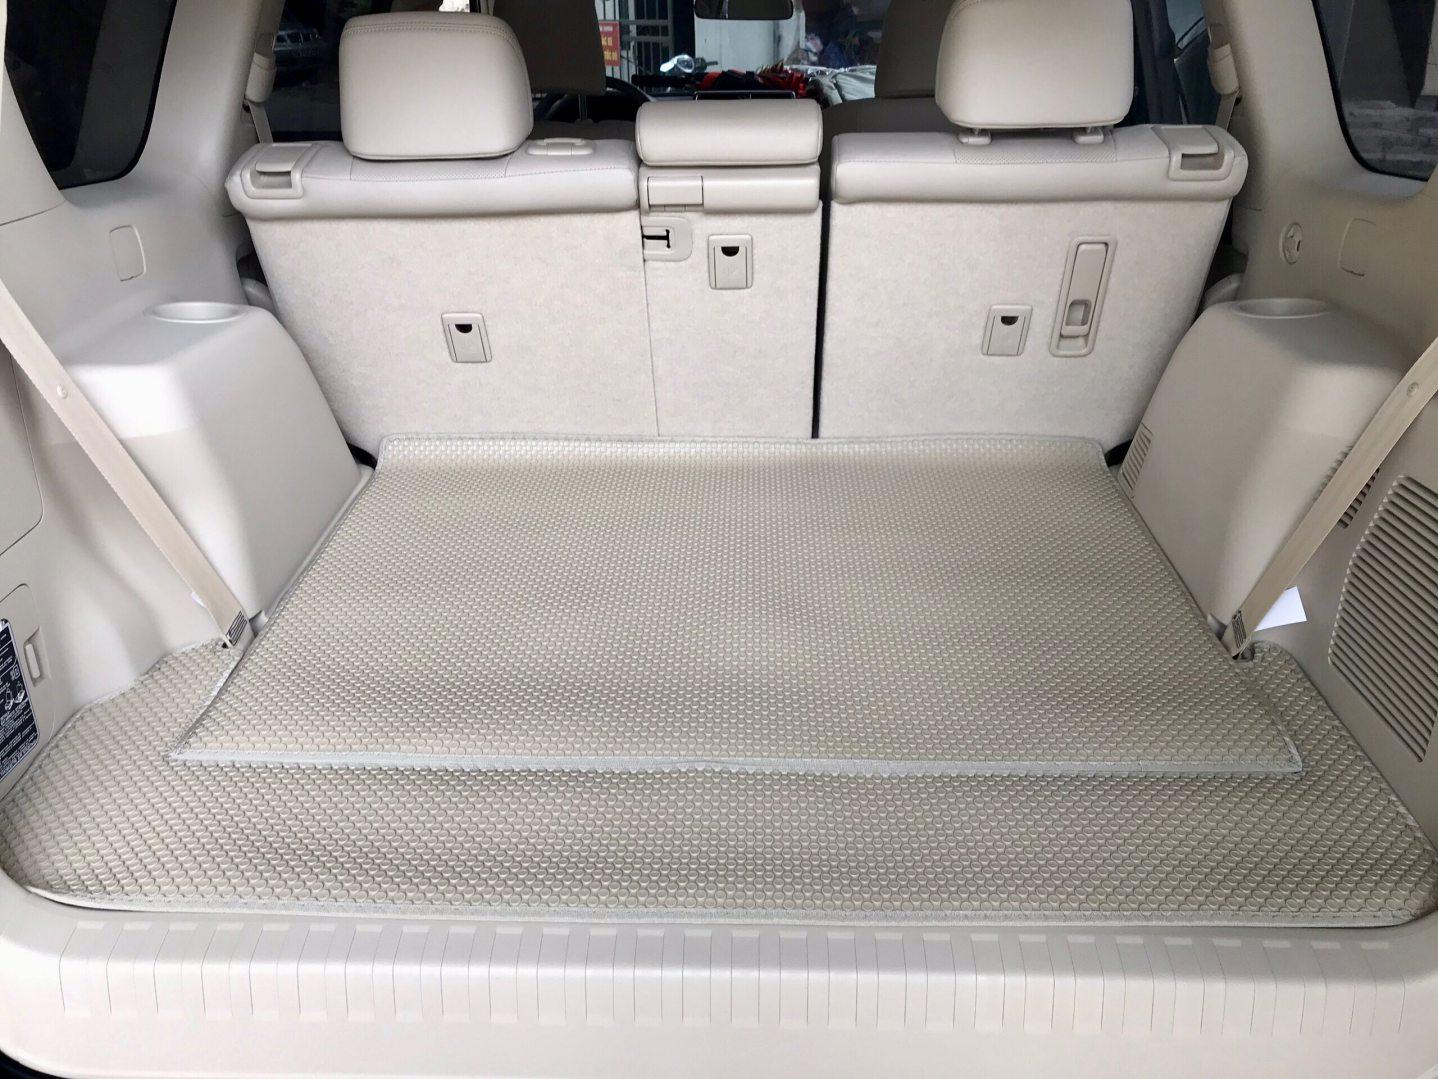 Thảm lót cốp Toyota Prado 2019